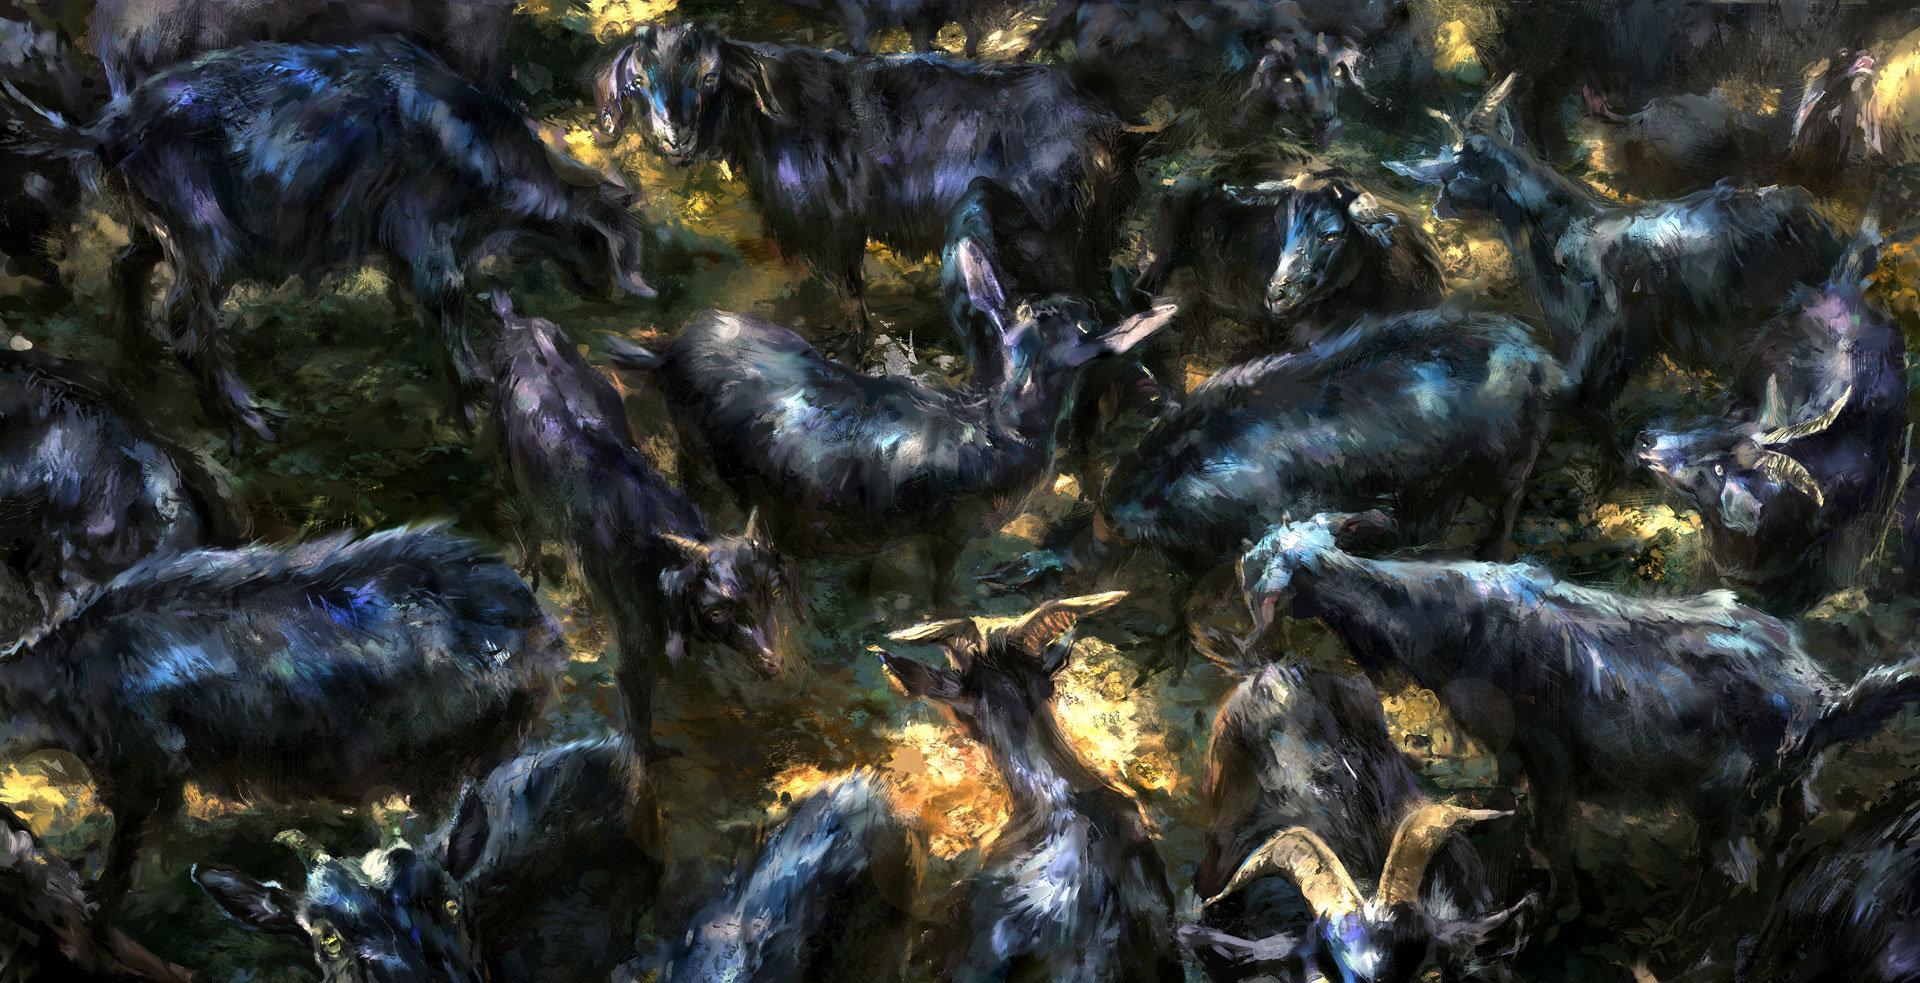 Jakub javora kozy 1080